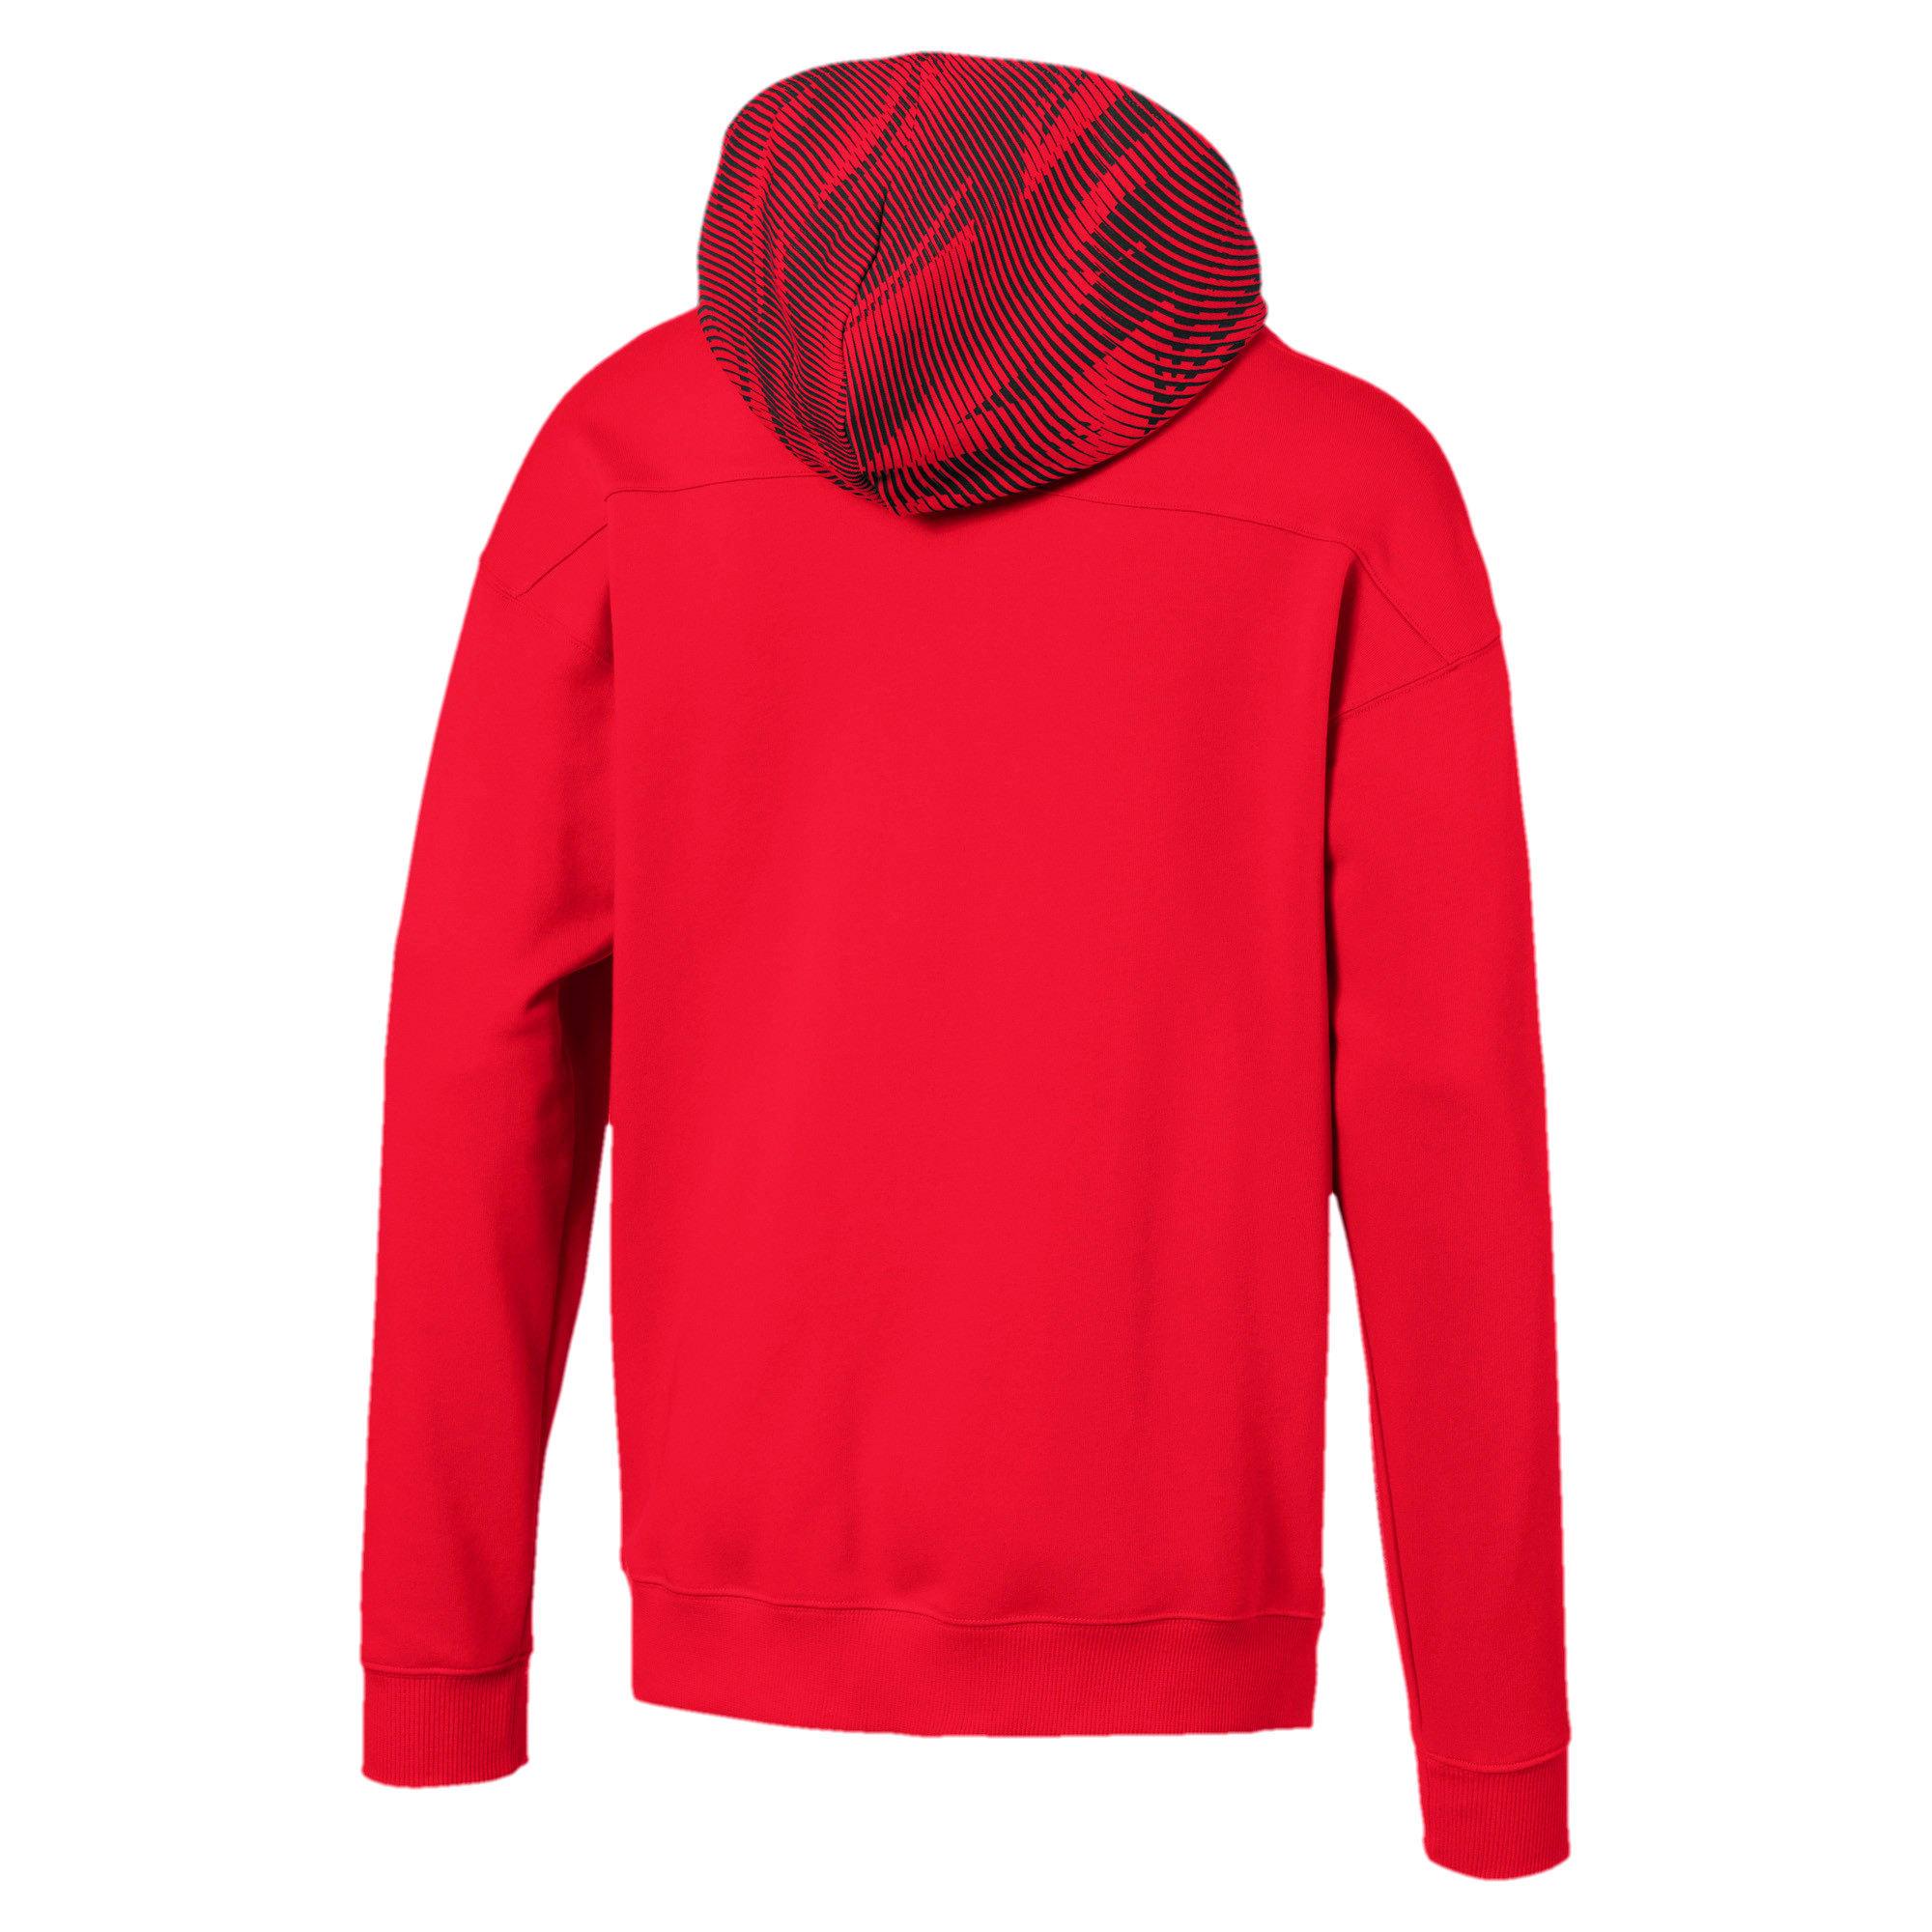 Thumbnail 5 of AC Milan Casuals Men's Hoodie, Tango Red -Puma Black, medium